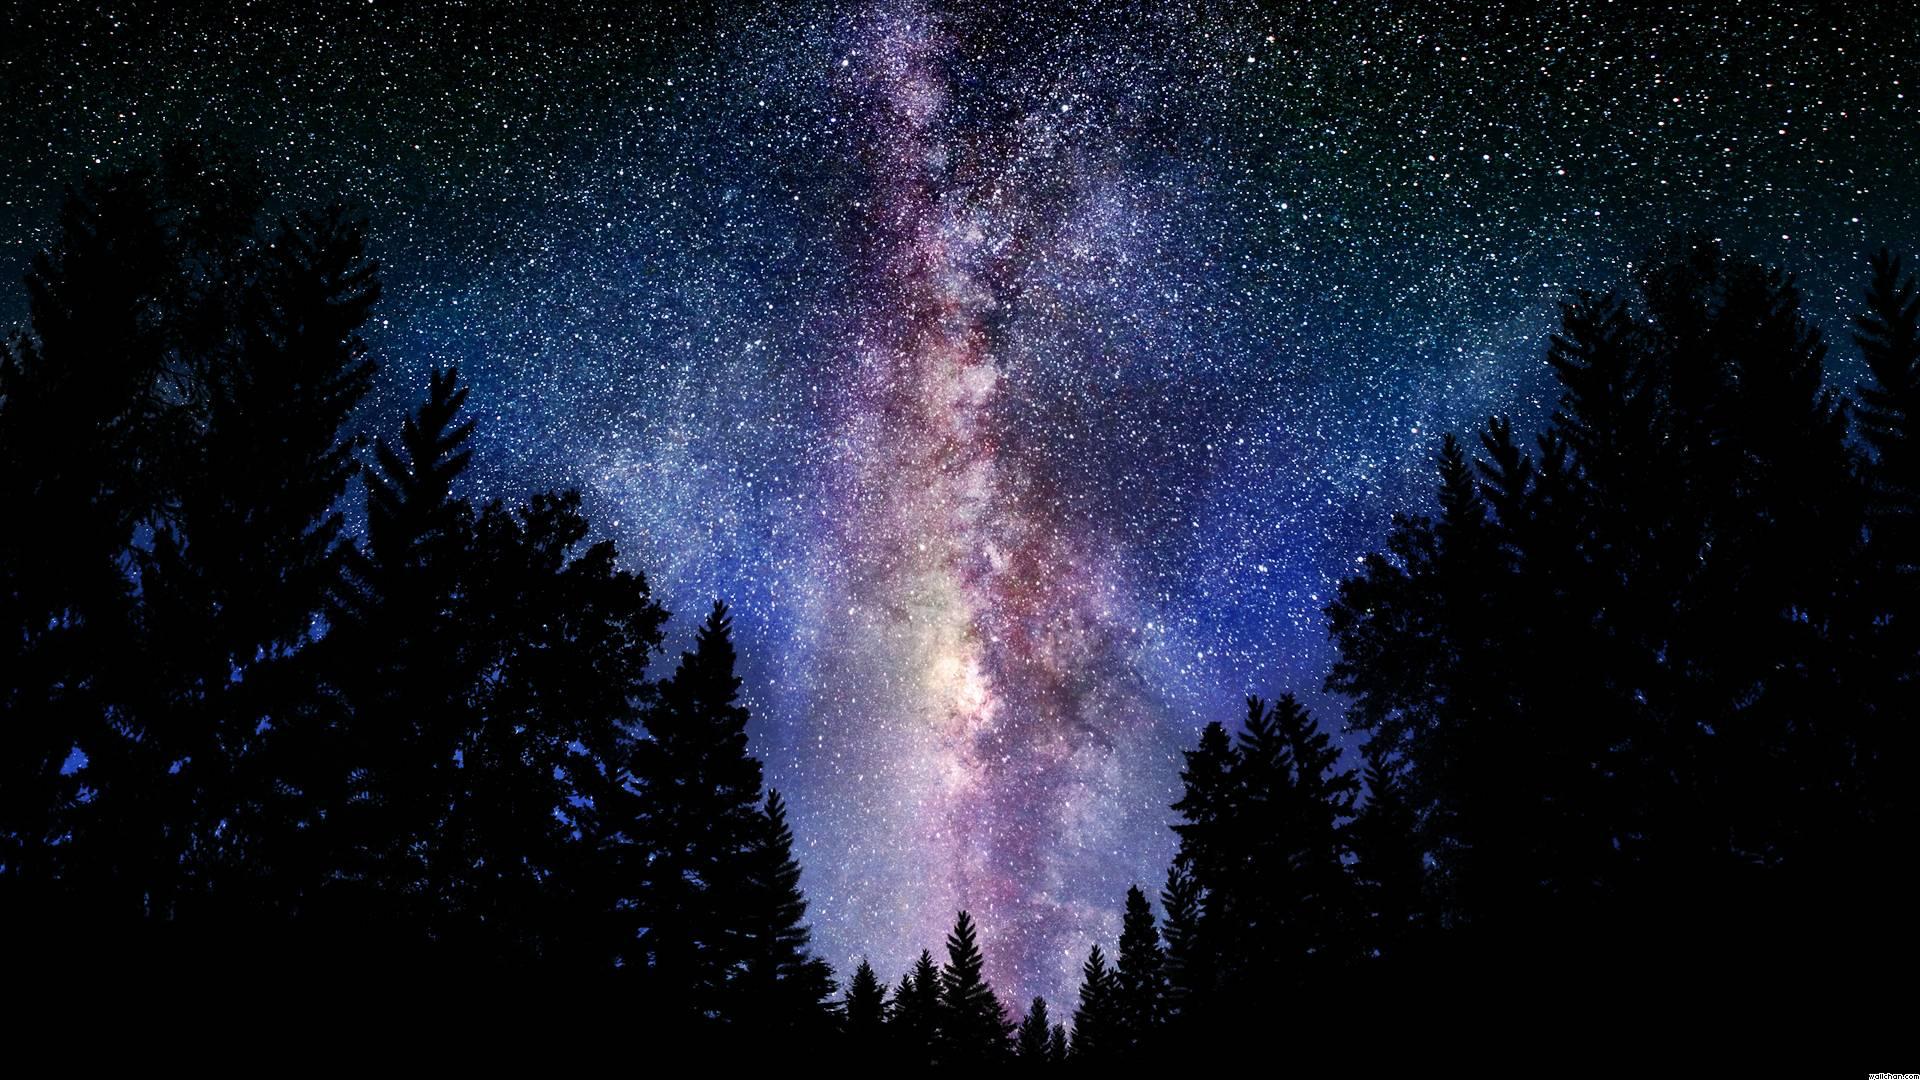 Milky Way Galaxy Desktop Wallpaper - WallpaperSafari